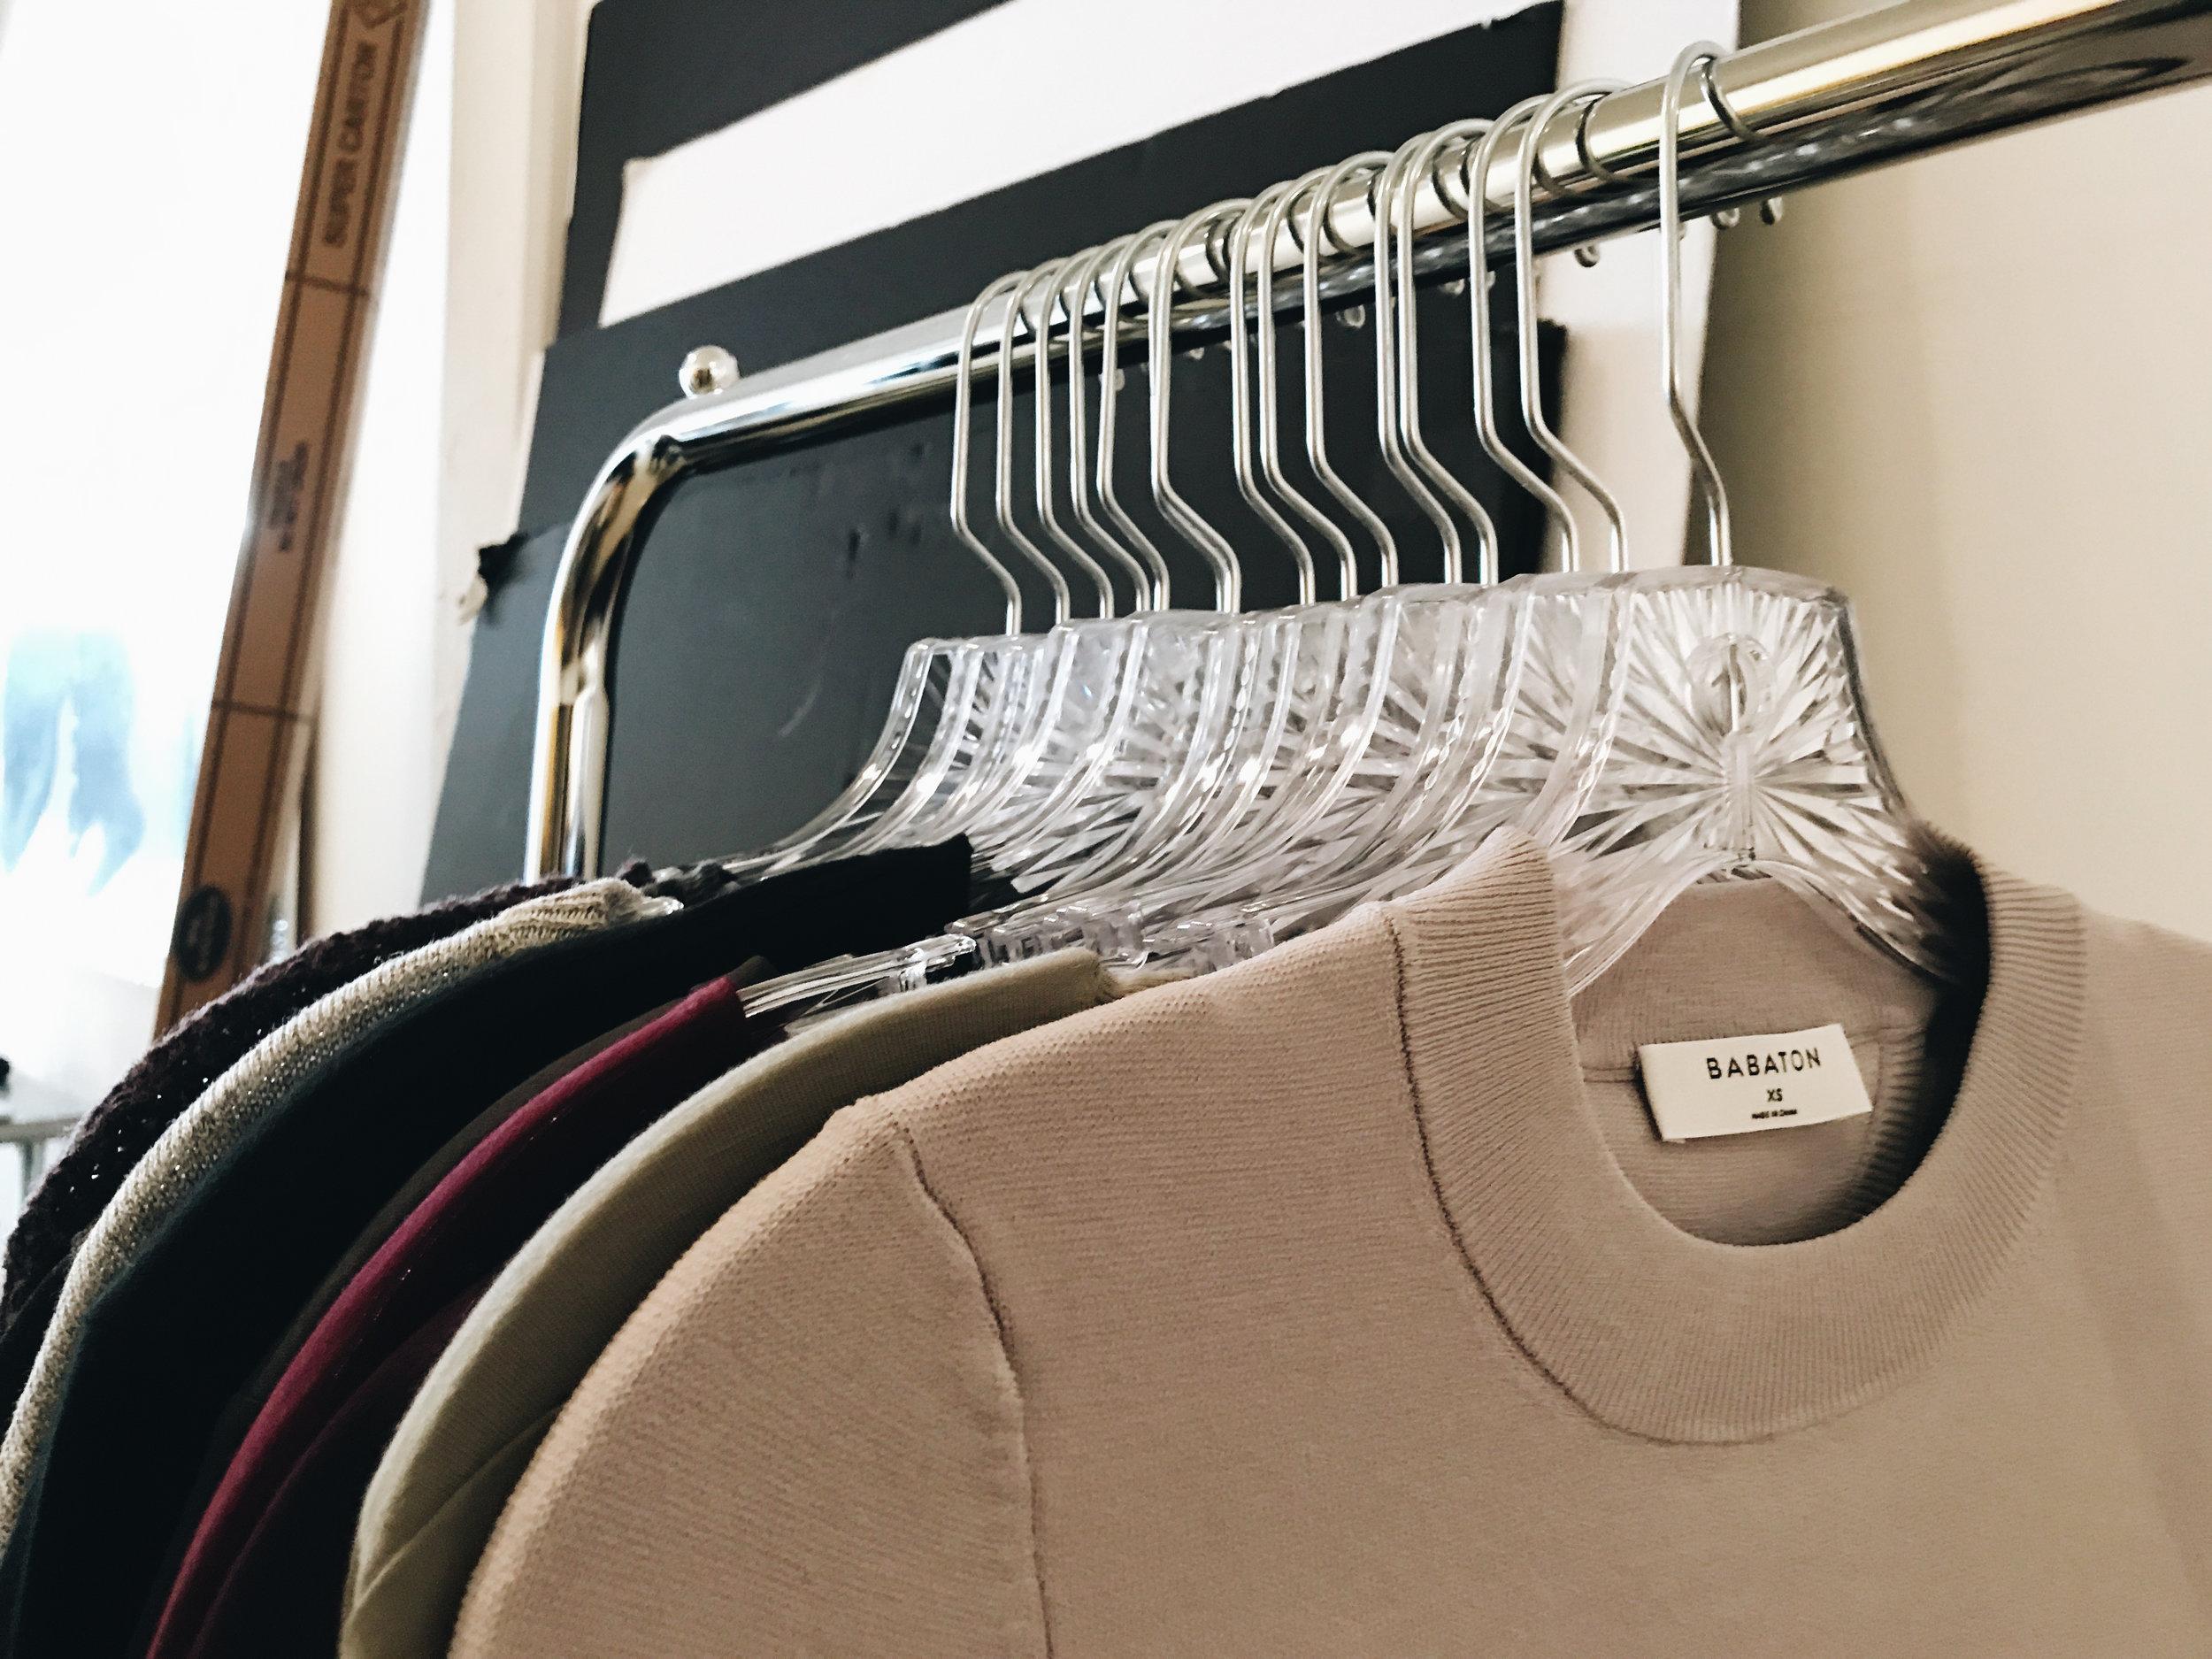 Wardrobe set up